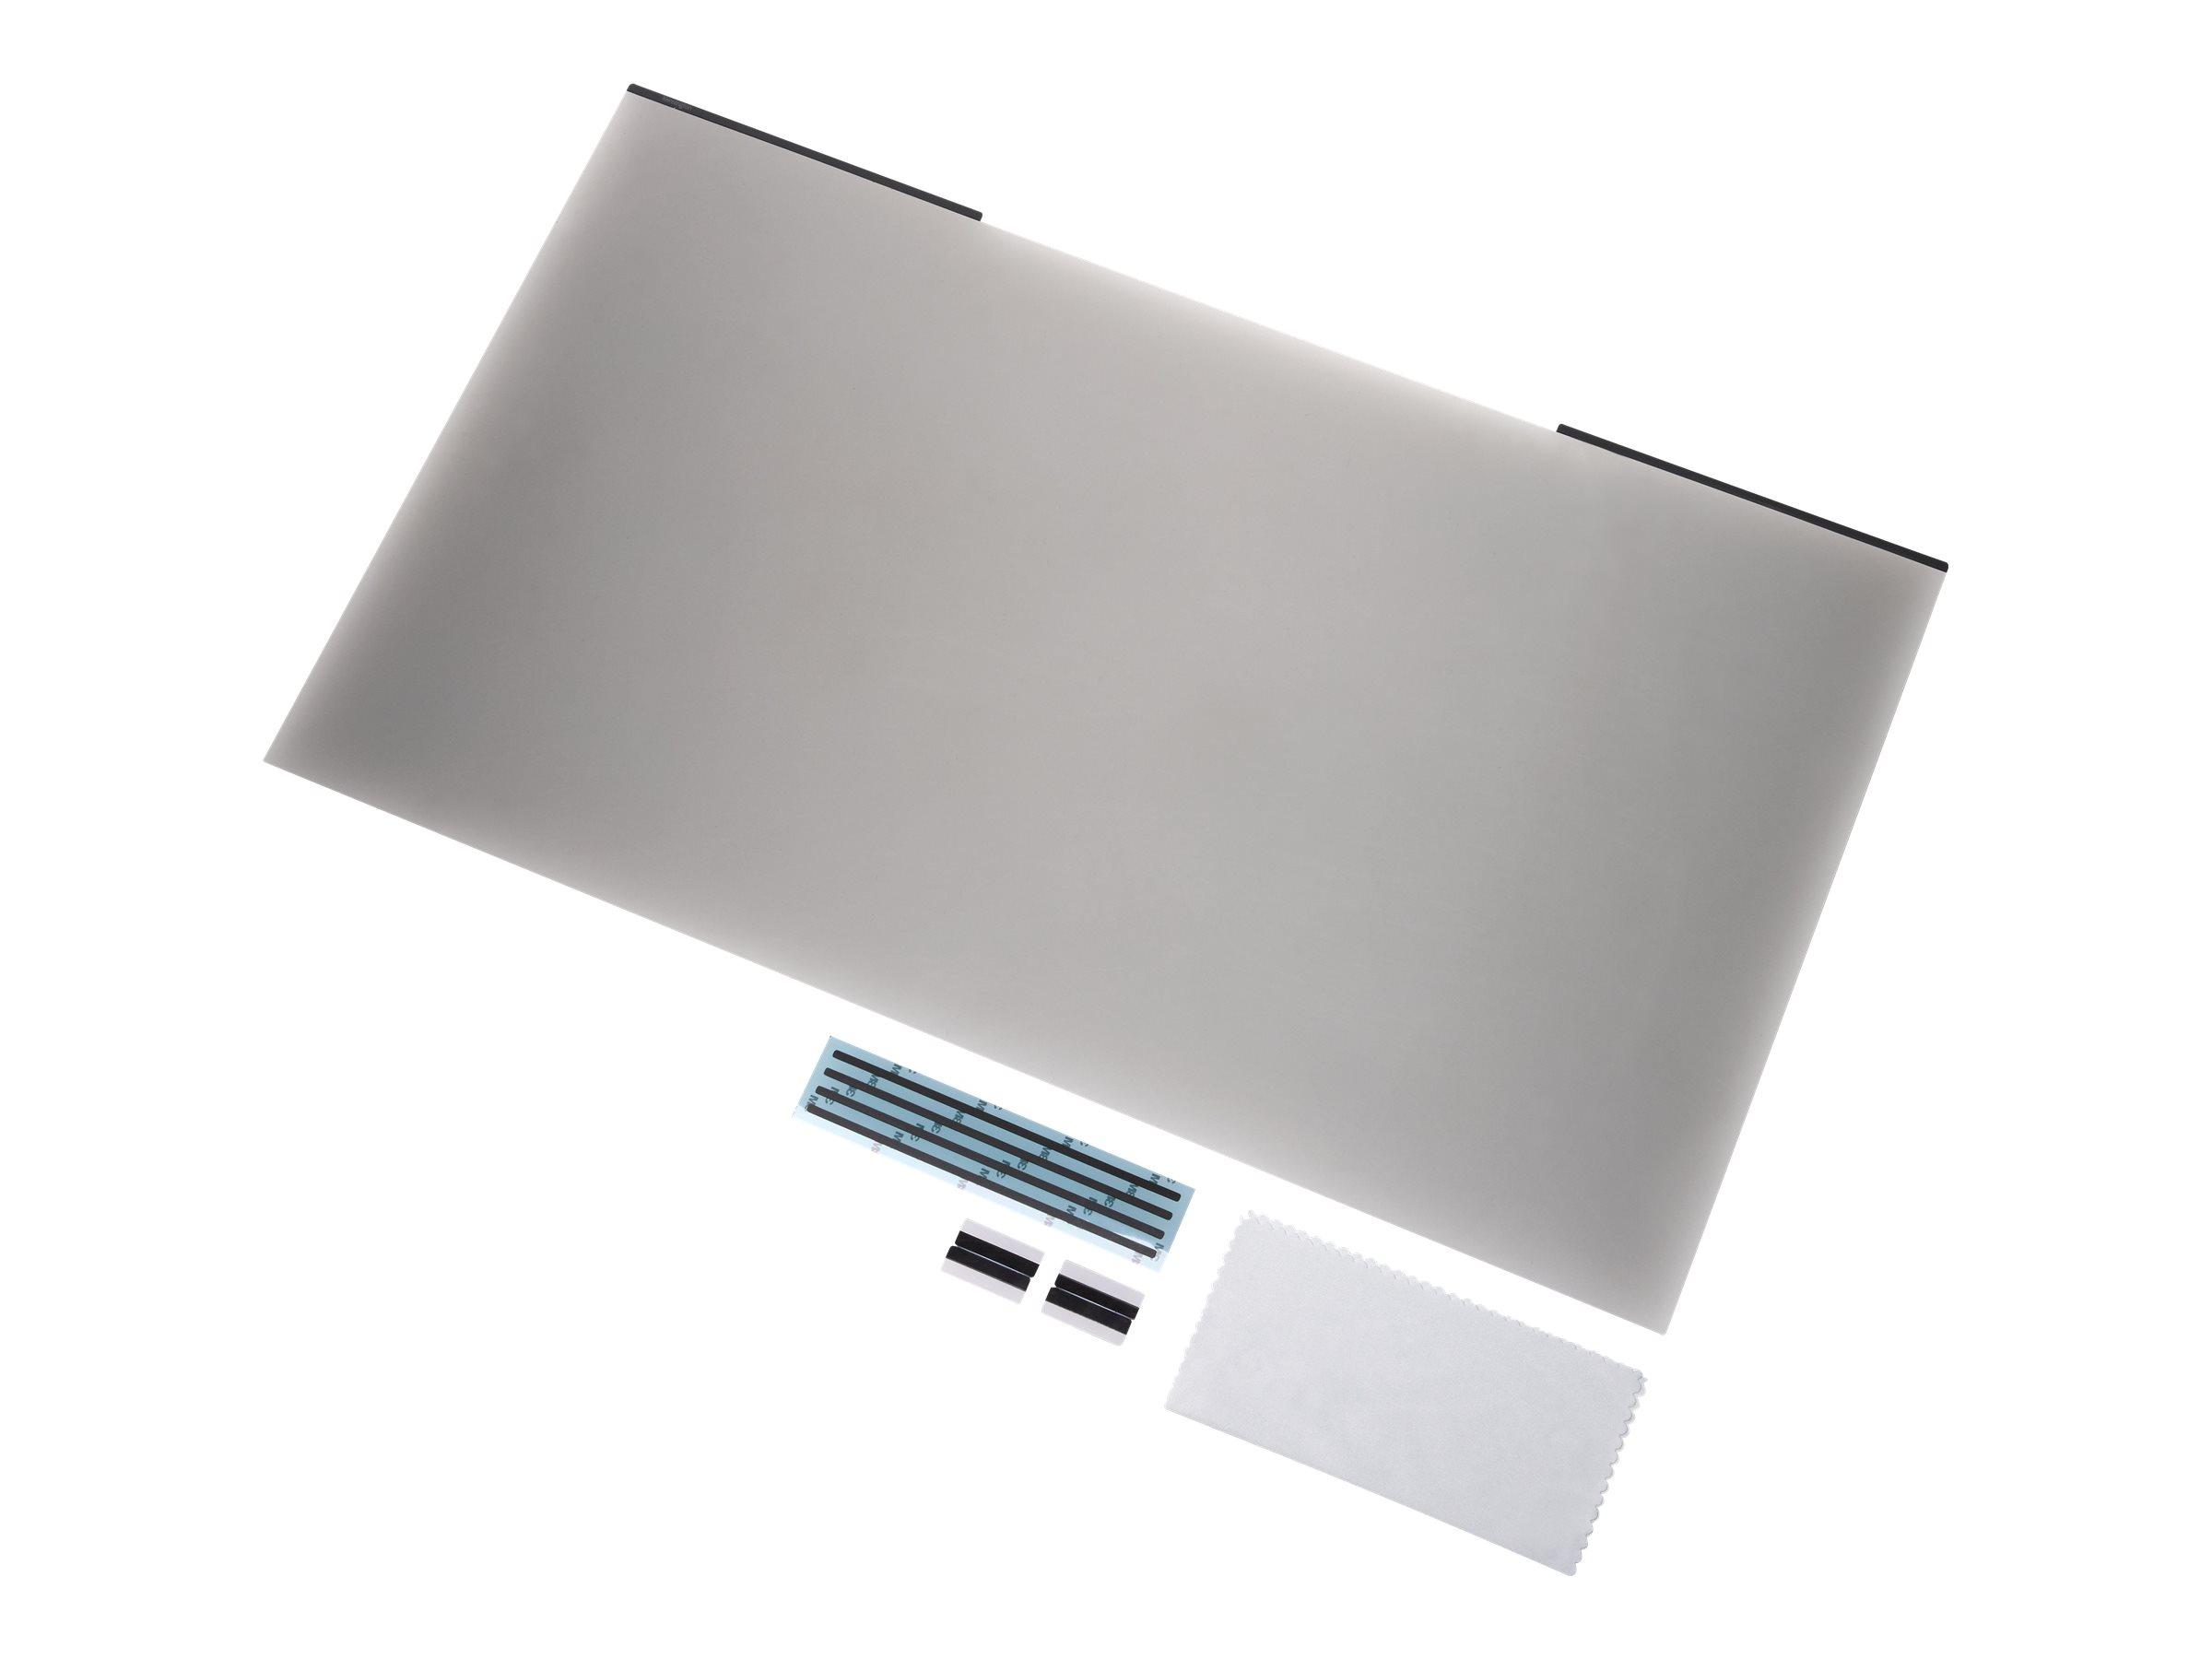 "Vorschau: Kensington MagPro 21.5"" (16:9) Monitor Privacy Screen with Magnetic Strip - Blickschutzfilter für Bildschirme - 54.6 cm (21.5"")"